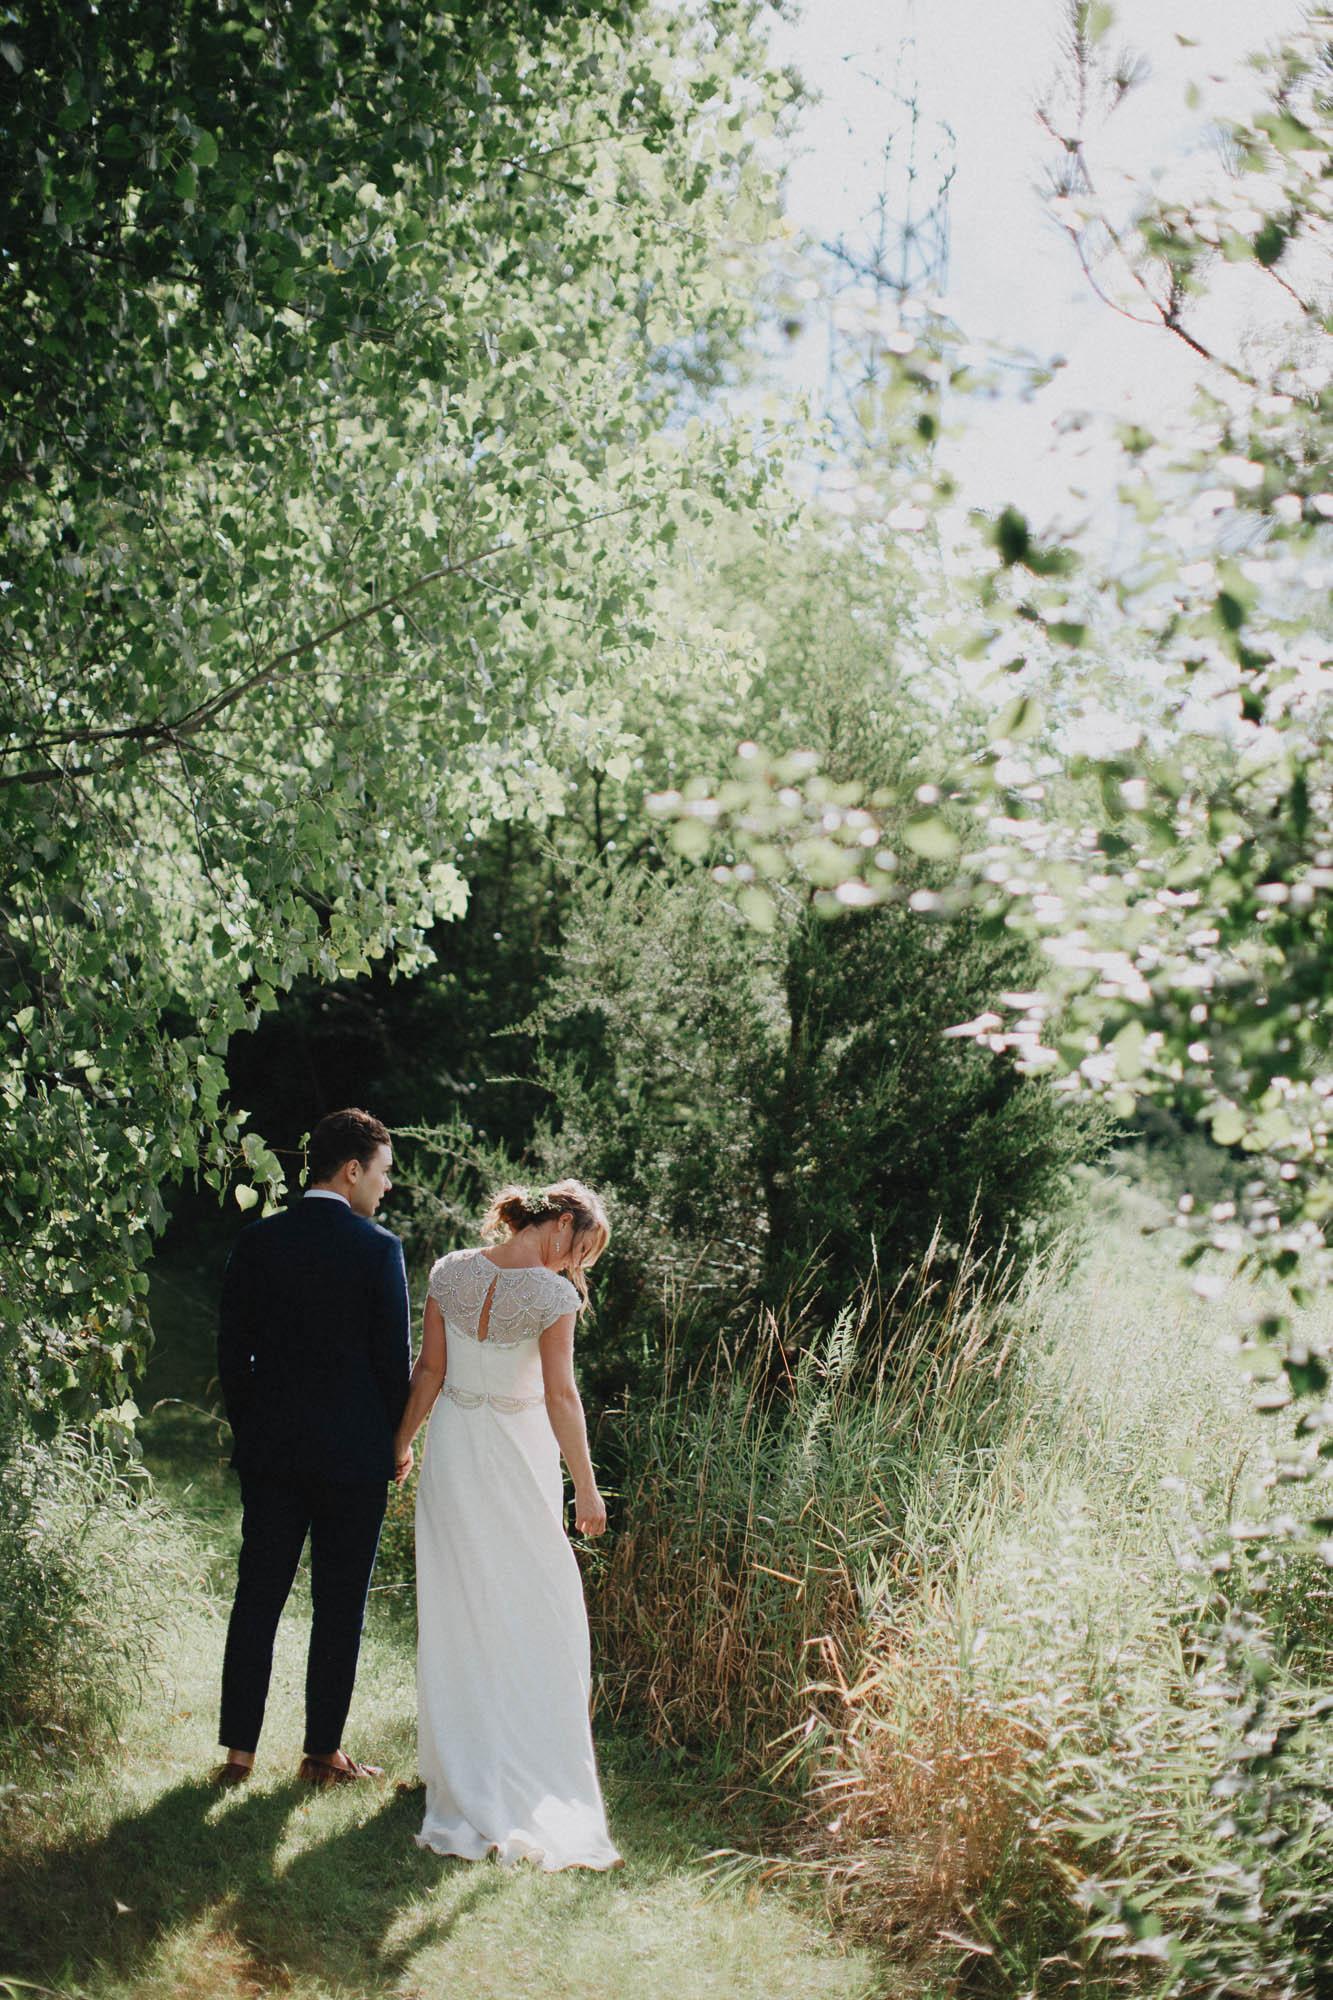 Leah-Graham-Michigan-Outdoor-DIY-Wedding-080@2x.jpg